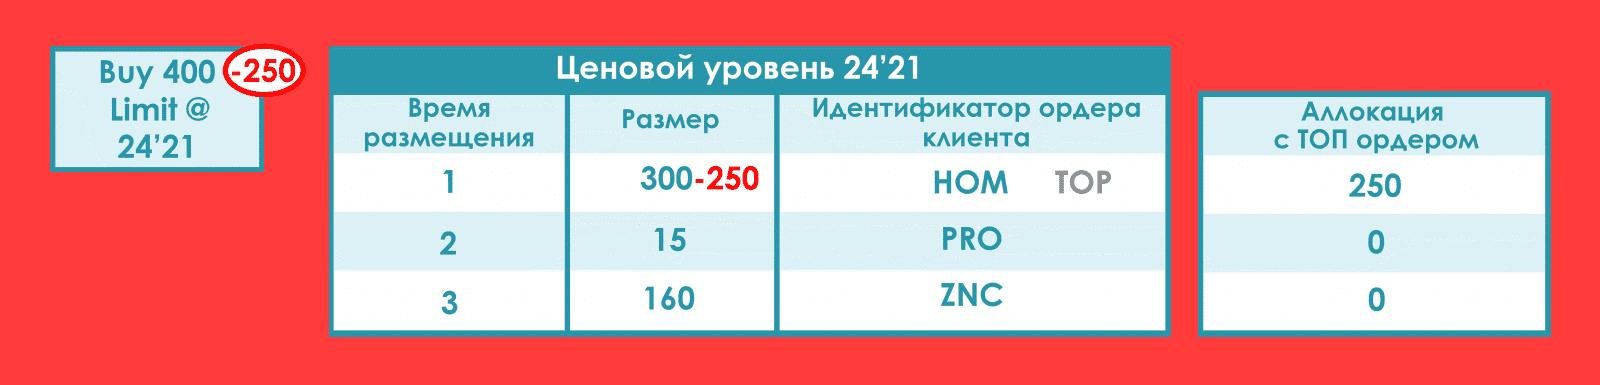 Ордер ZNC система идентифицировала